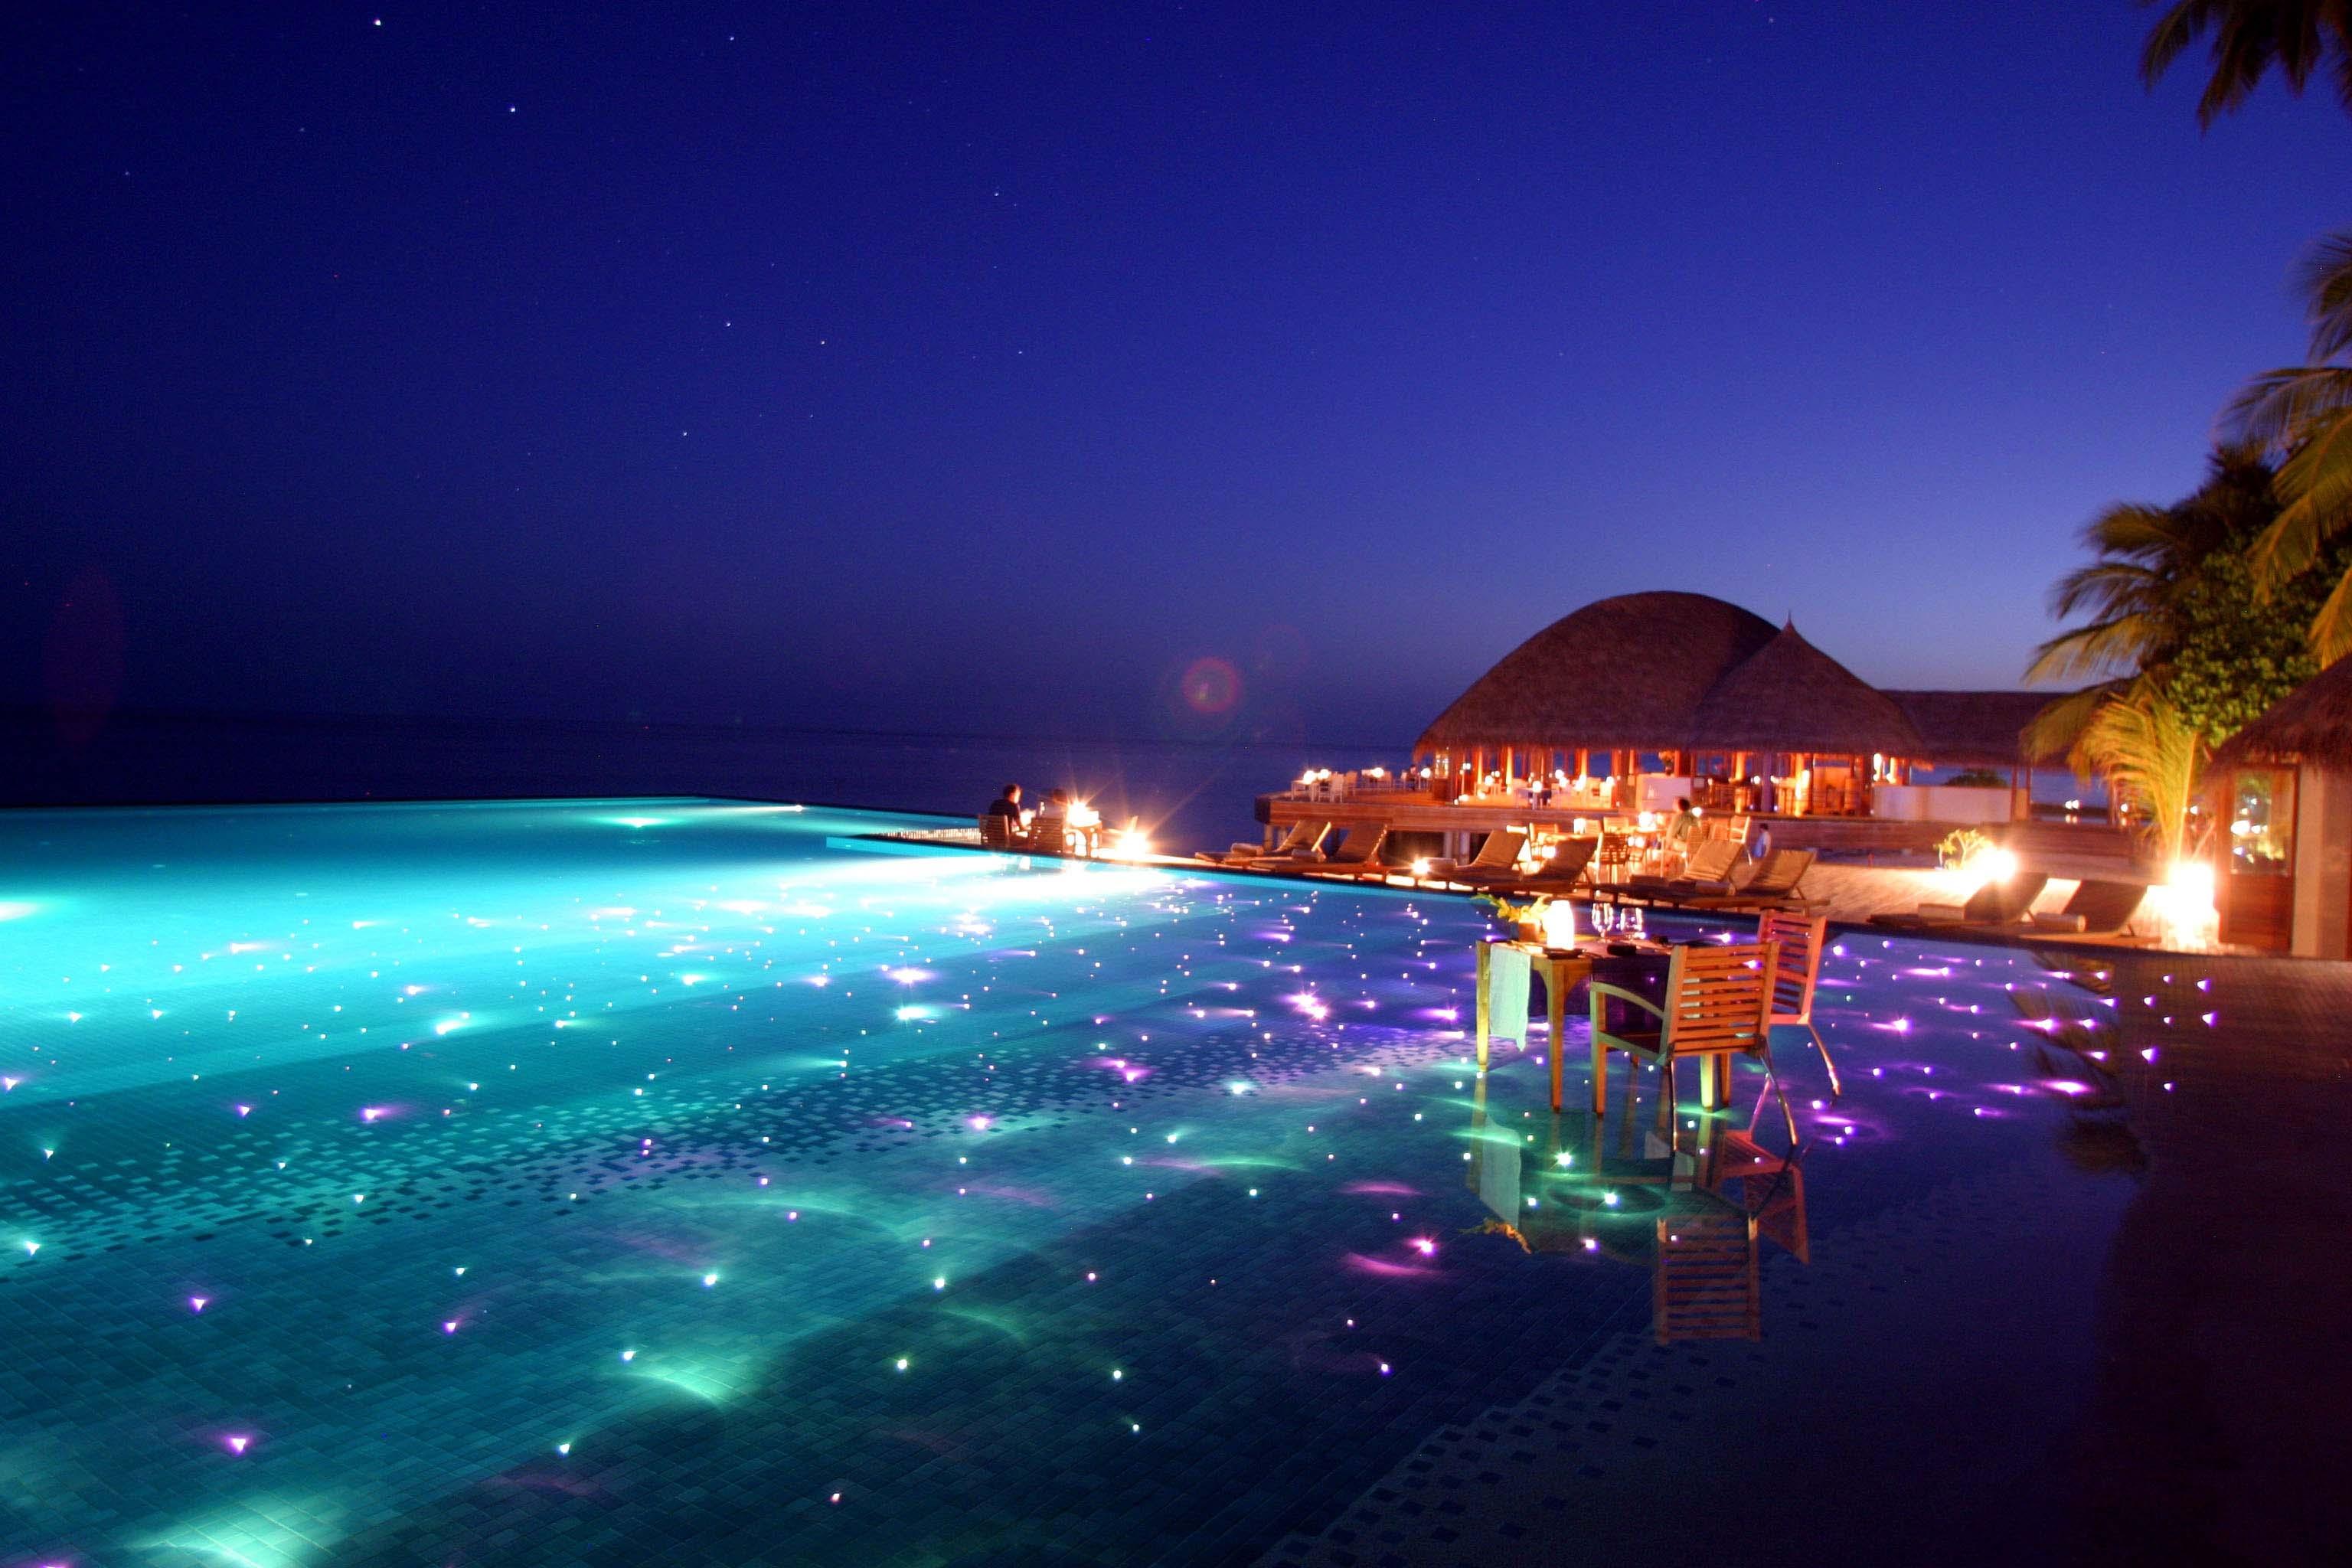 92682 download wallpaper Miscellanea, Miscellaneous, Maldives, Tropics, Resort, Evening screensavers and pictures for free